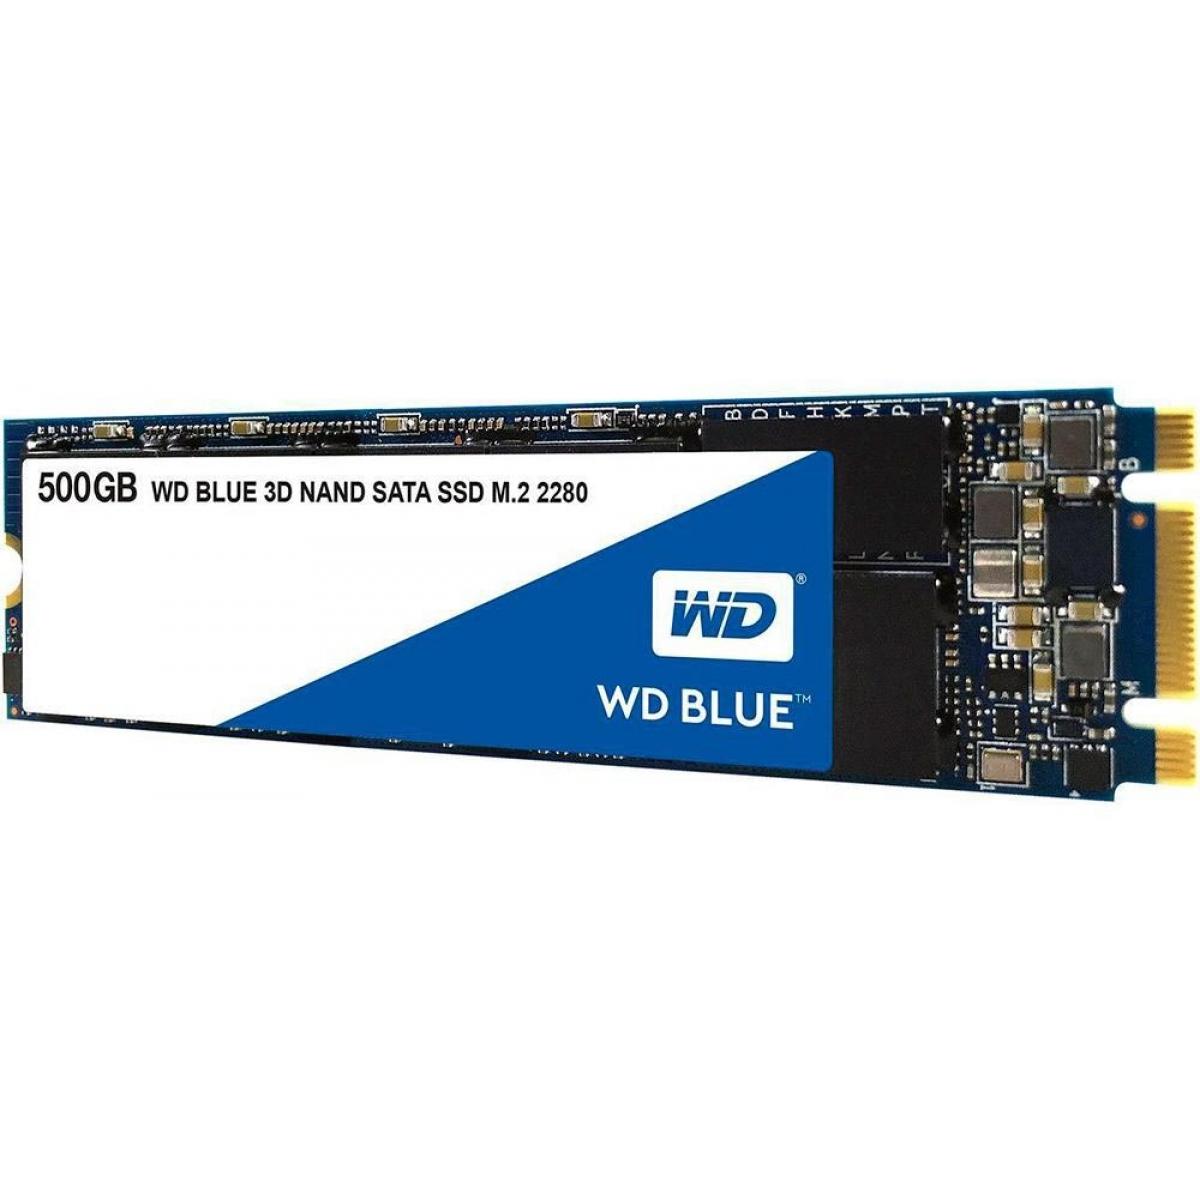 SSD WD Blue 500GB, M.2 2280, Leitura 560MBs e Gravação 530MBs, WDS500G2B0B